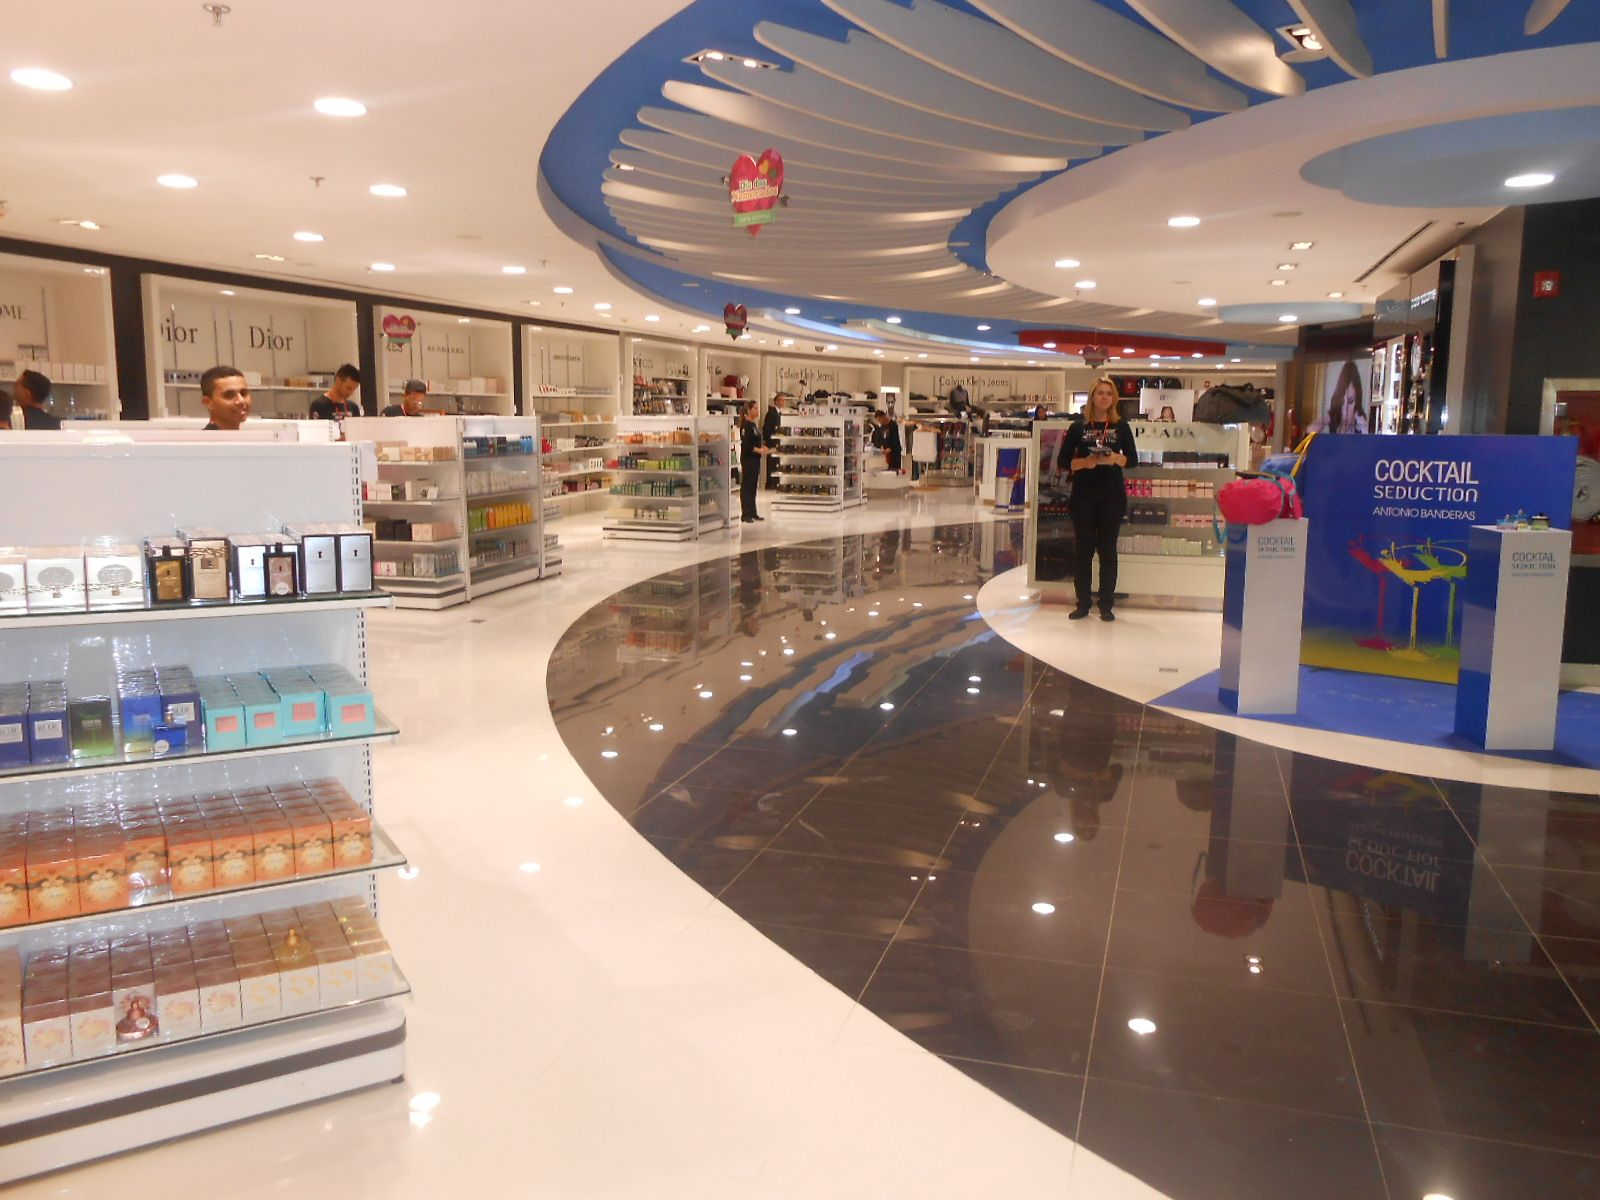 Mostaza Design | Dufry | Brasilia | Duty-free shop | #retaildesign #mostazadesign #dufry #interiordesign #interiors #retail #dutyfree #travelretail #perfumery